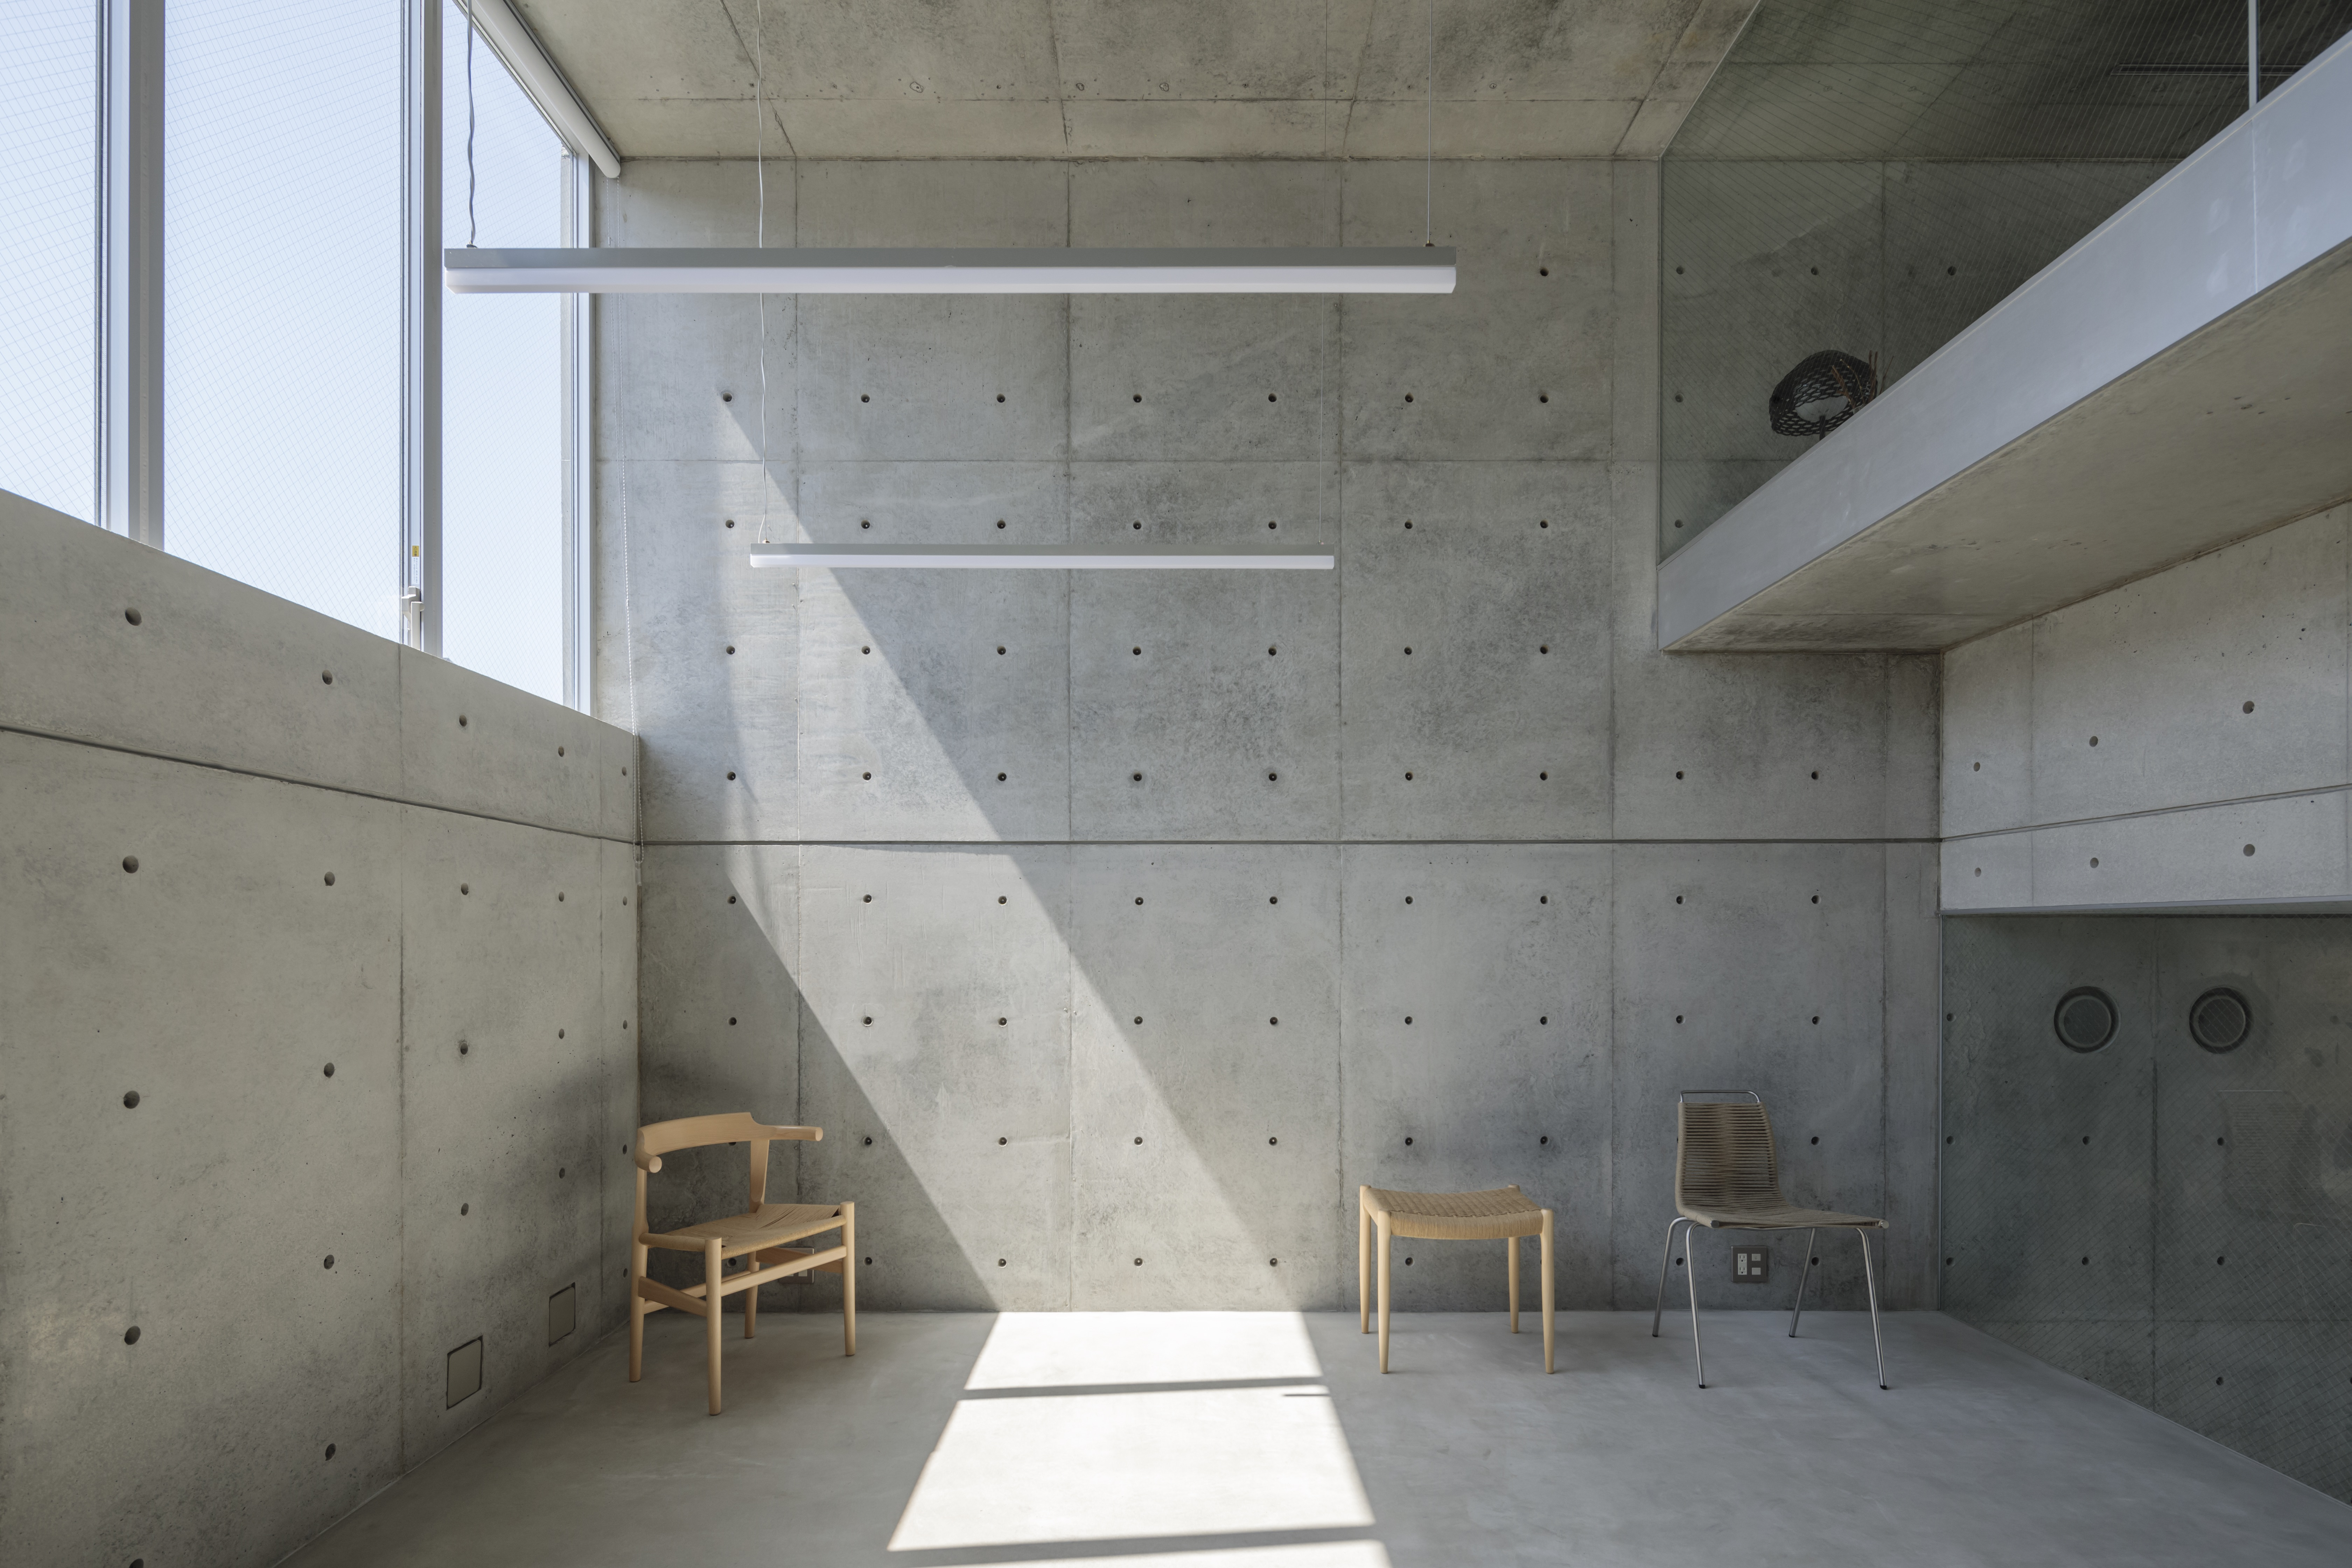 Atelier in Hakushima 08